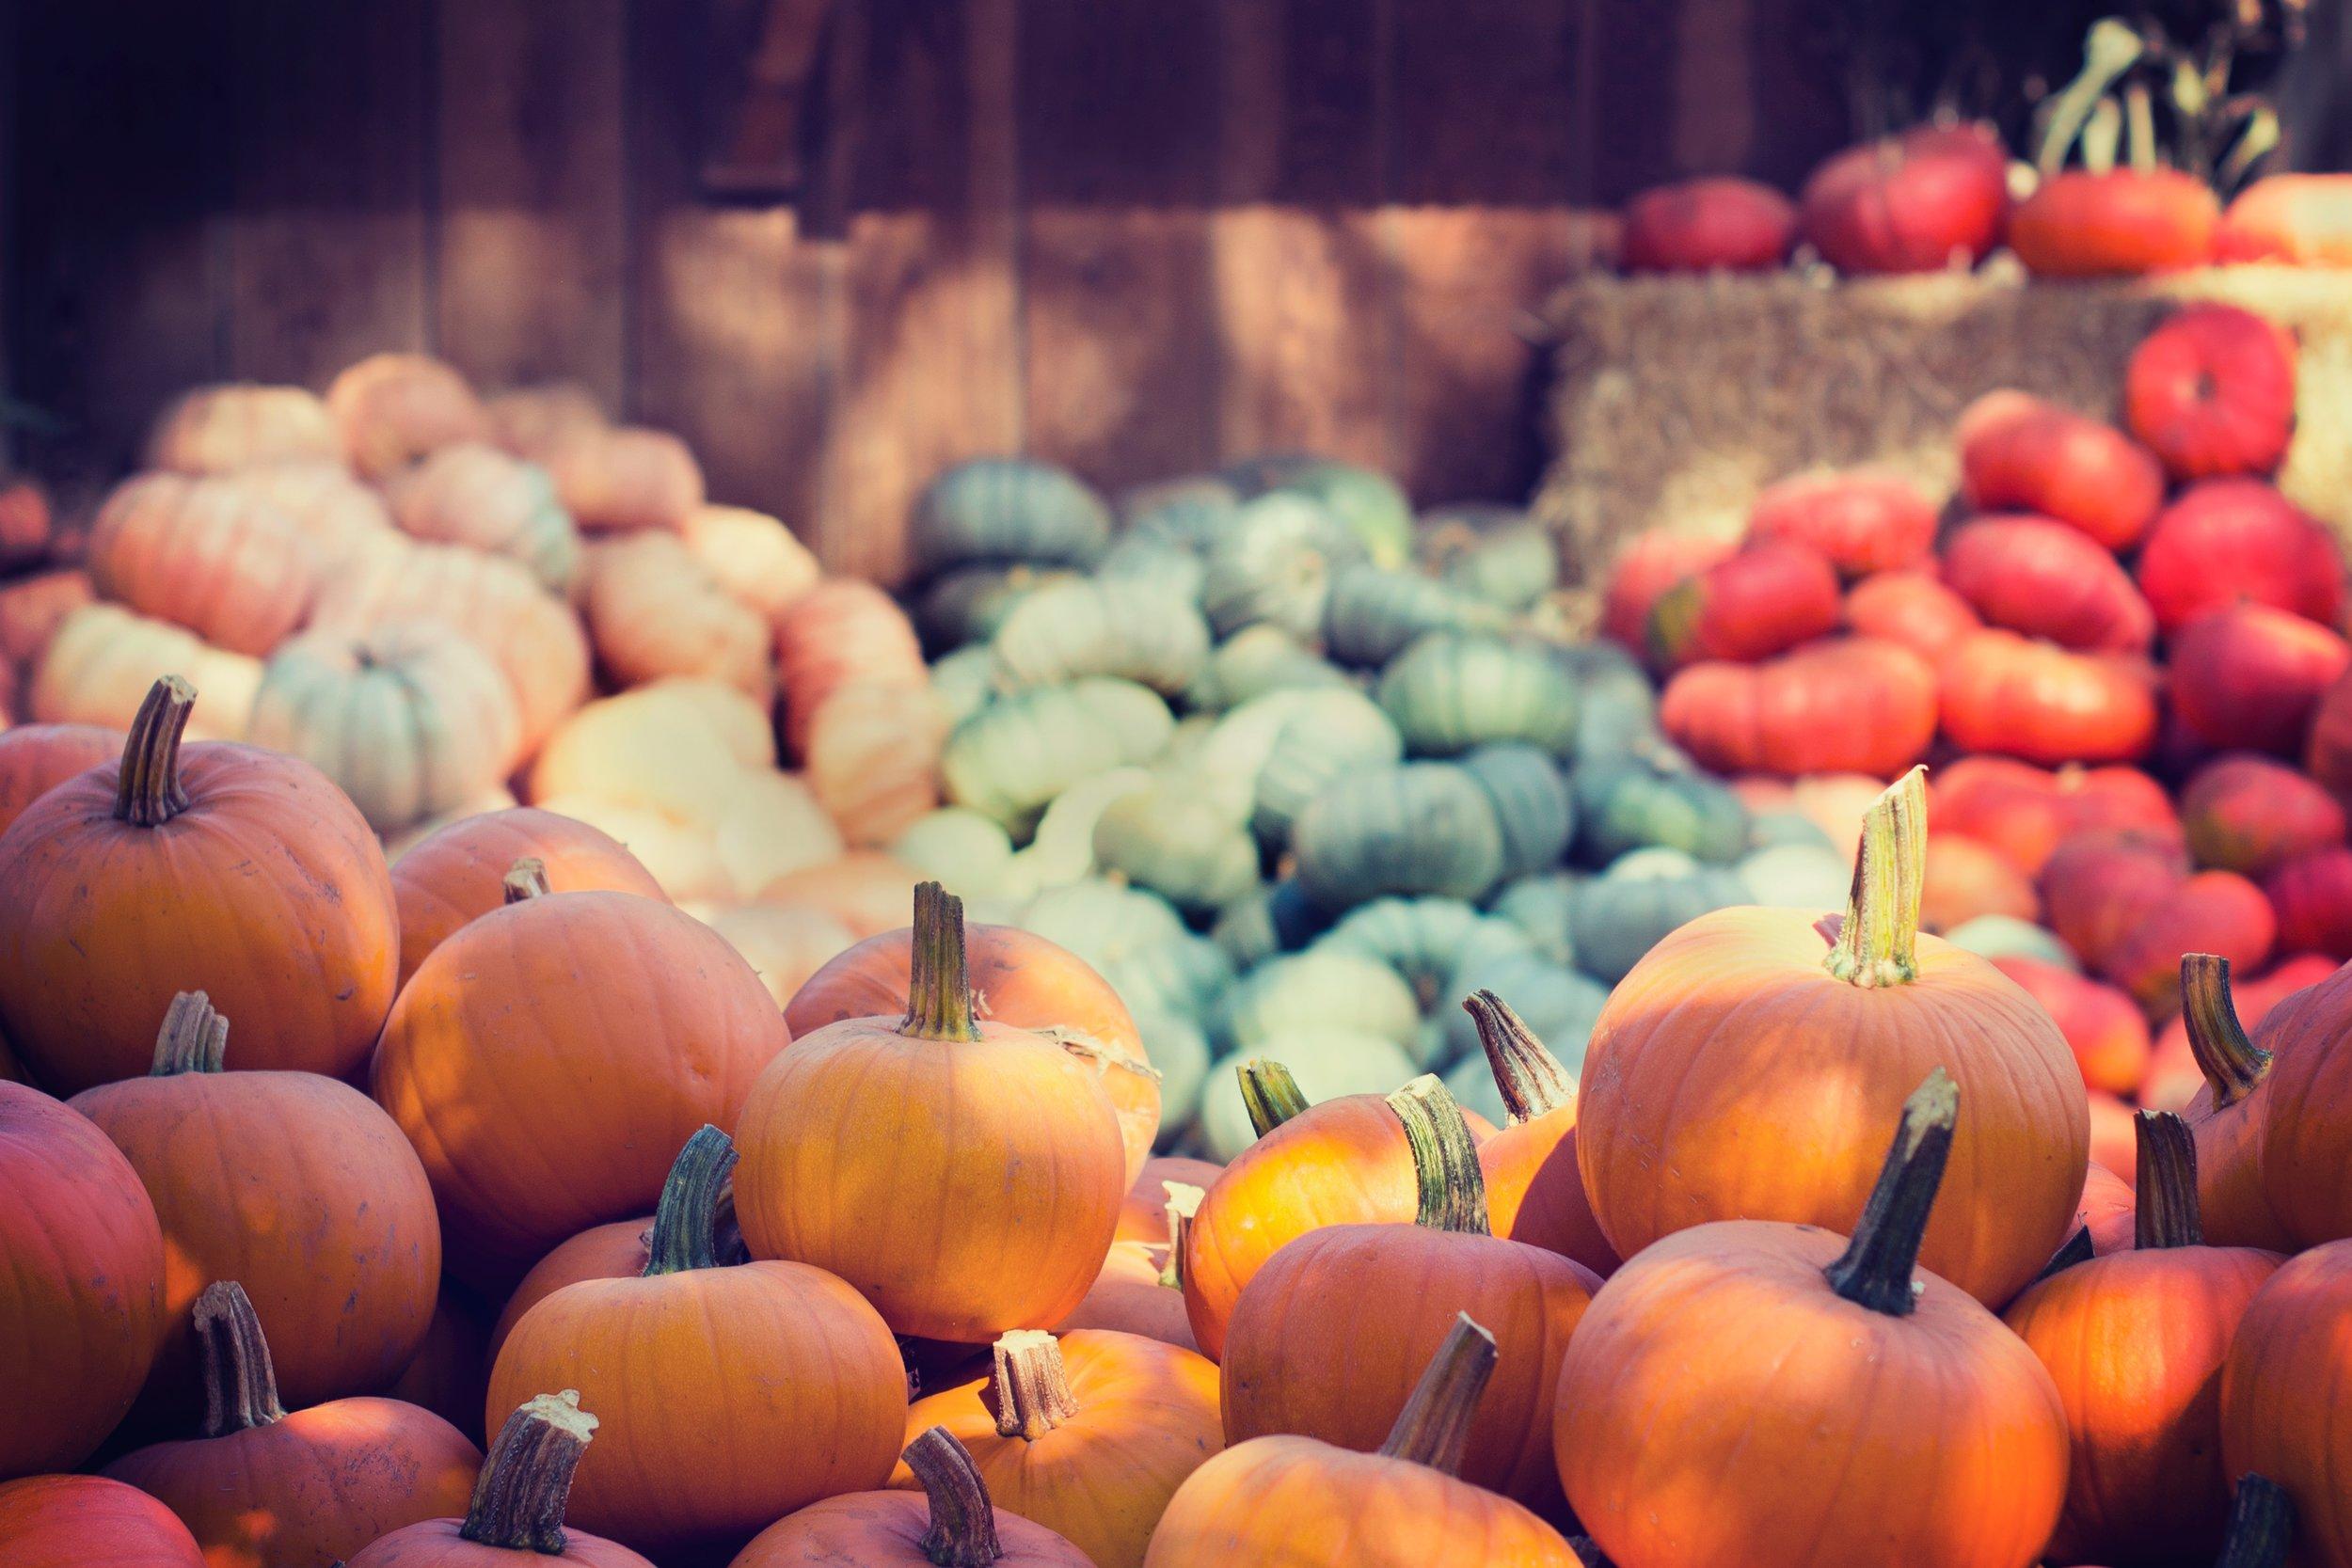 abundance-agriculture-close-up-383605.jpg